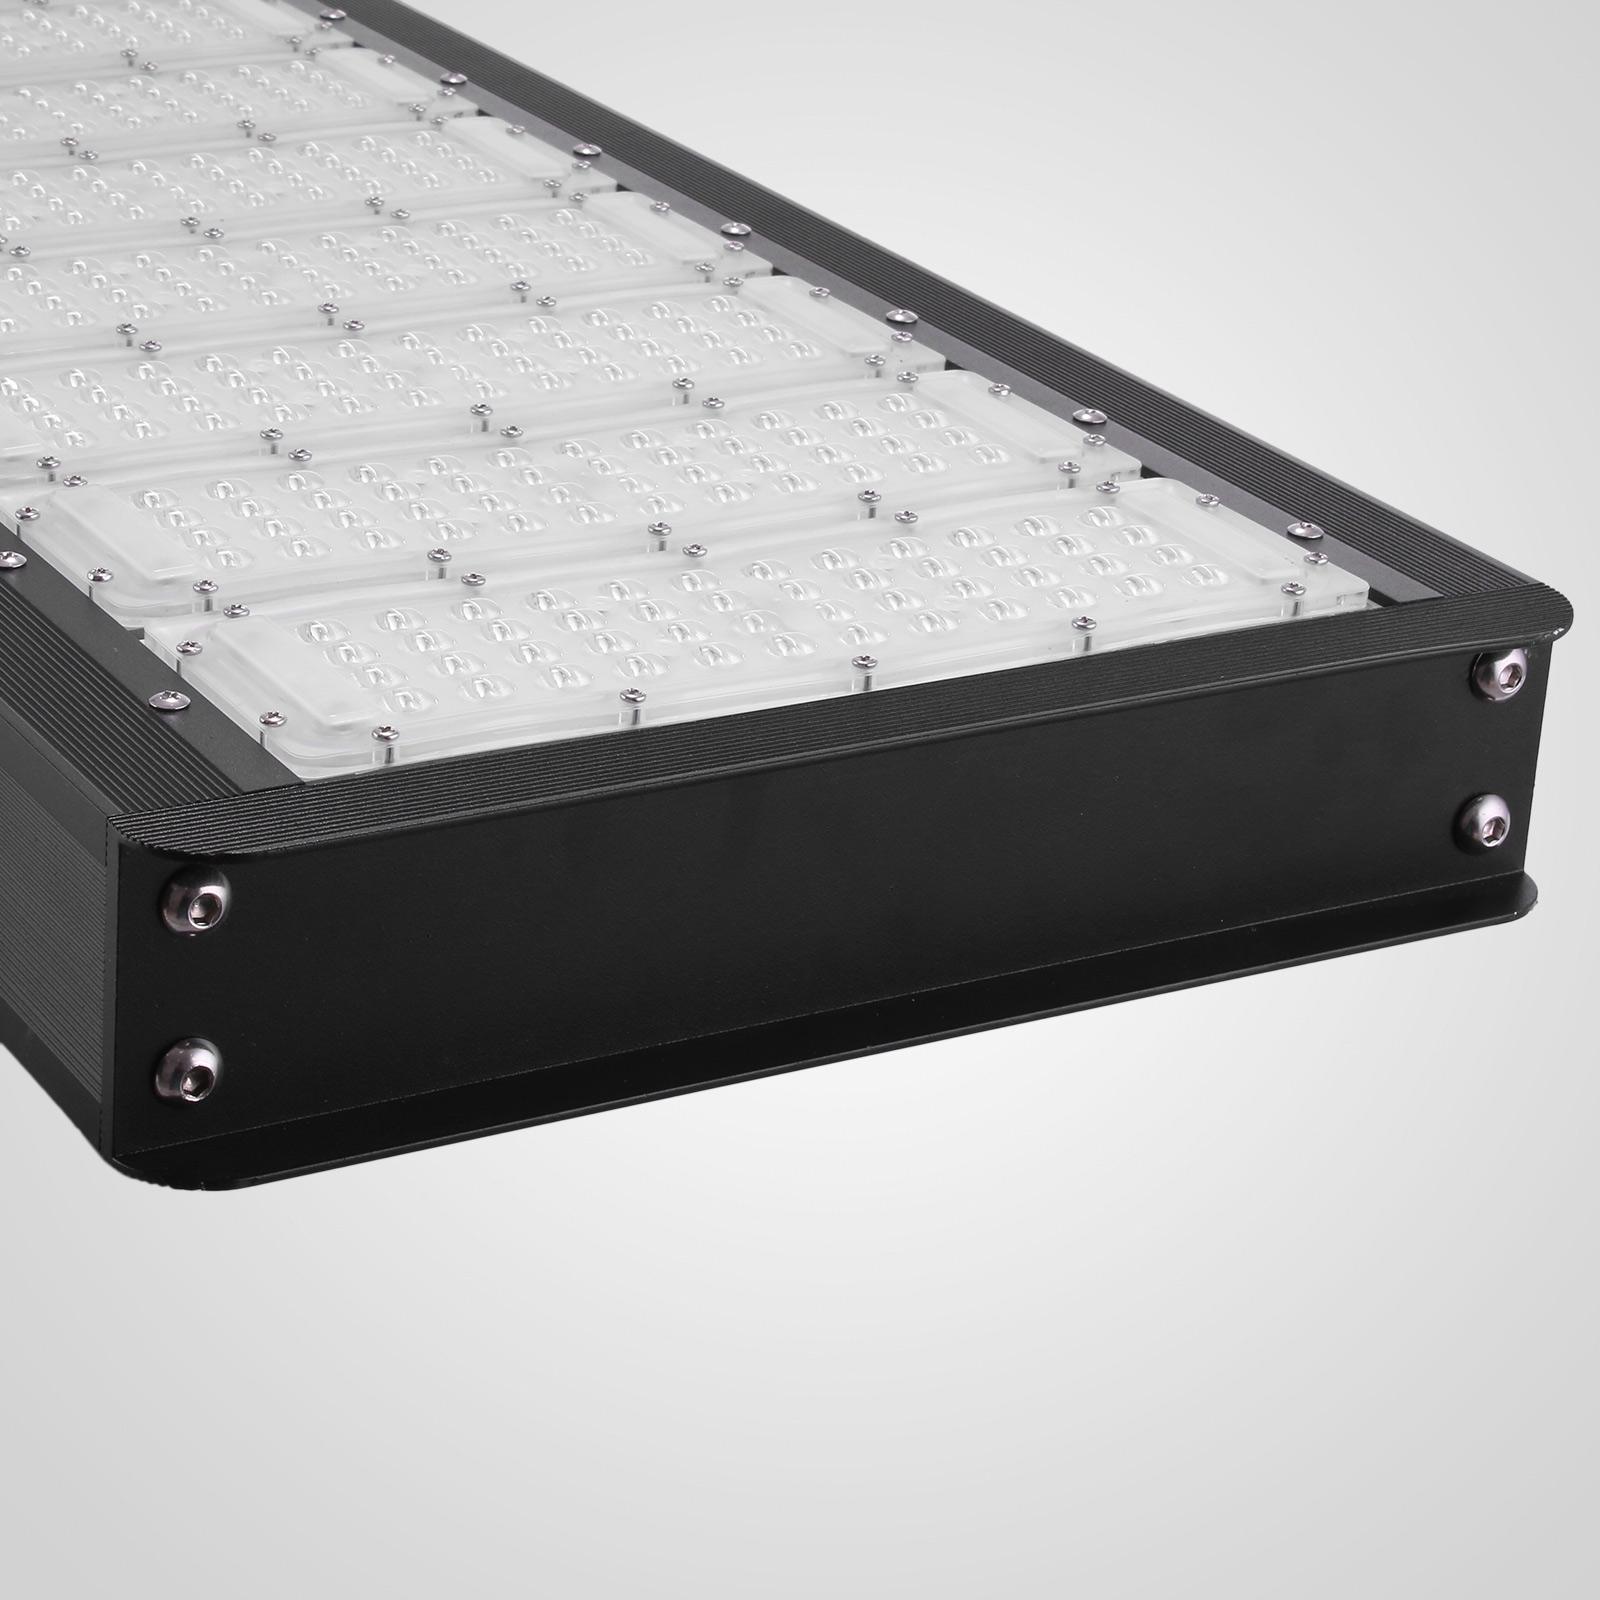 400w draussen led fluter lampe scheinwerfer kaltwei 40000lm beleuchtung ebay. Black Bedroom Furniture Sets. Home Design Ideas